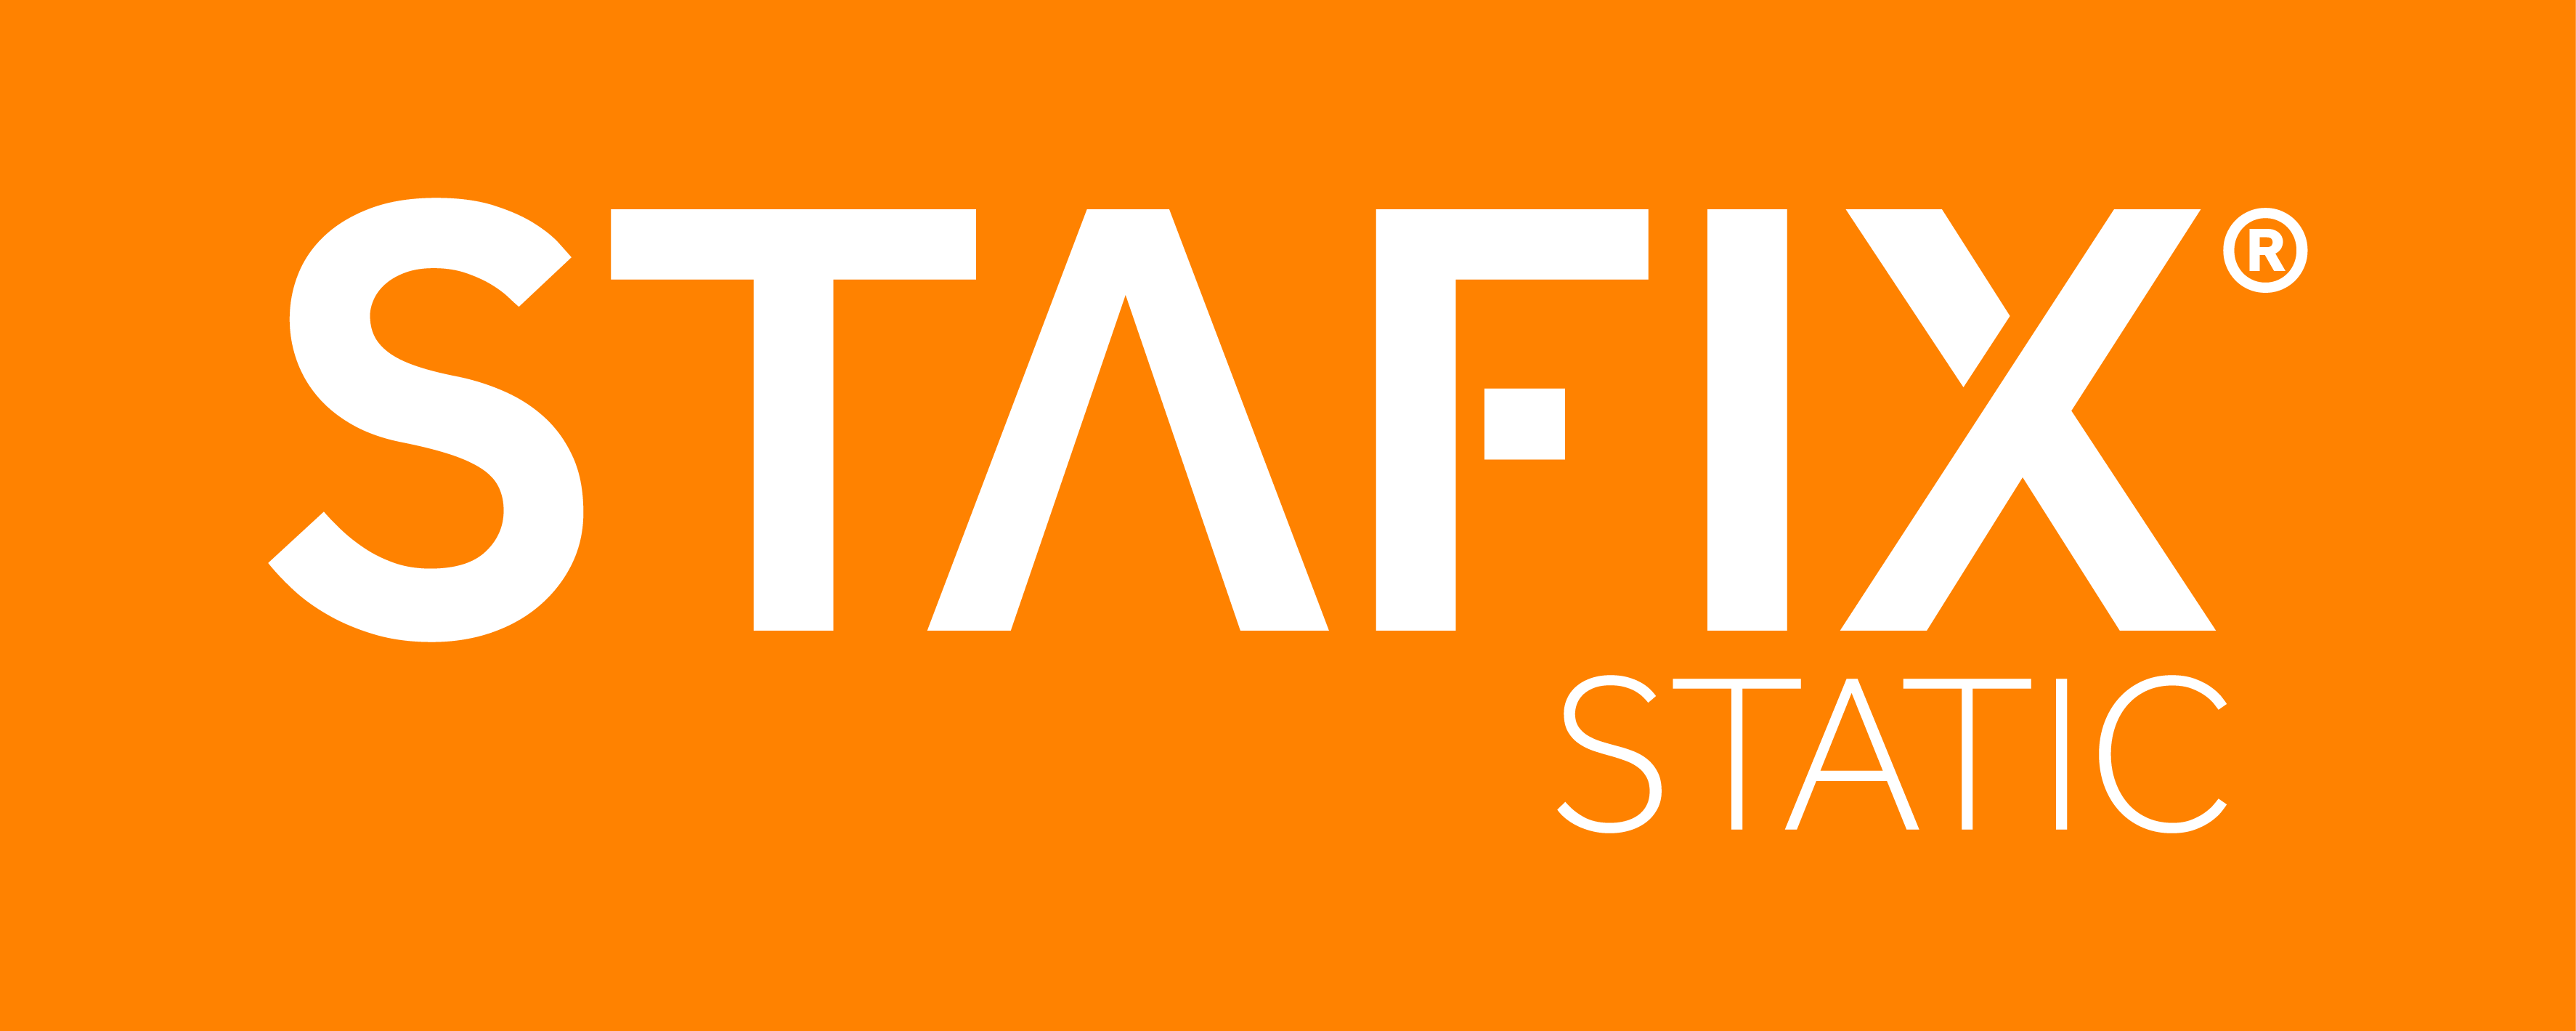 Afbeelding logo Satfix Static